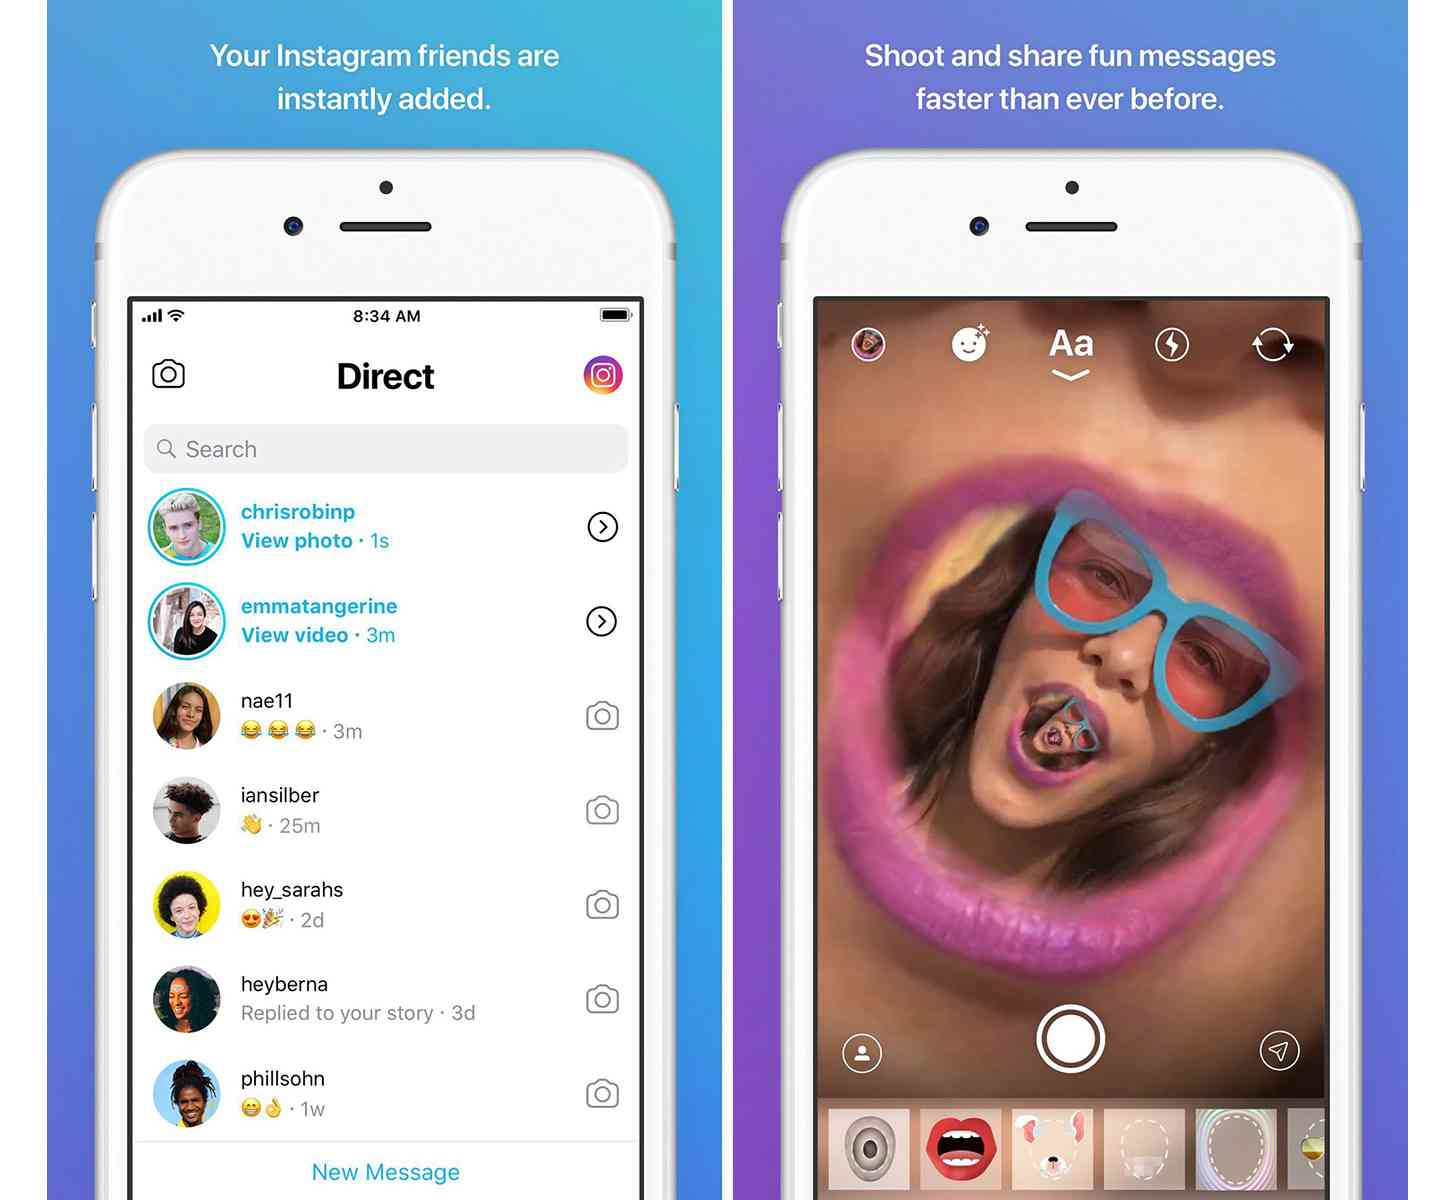 Instagram standalone Direct app screenshots